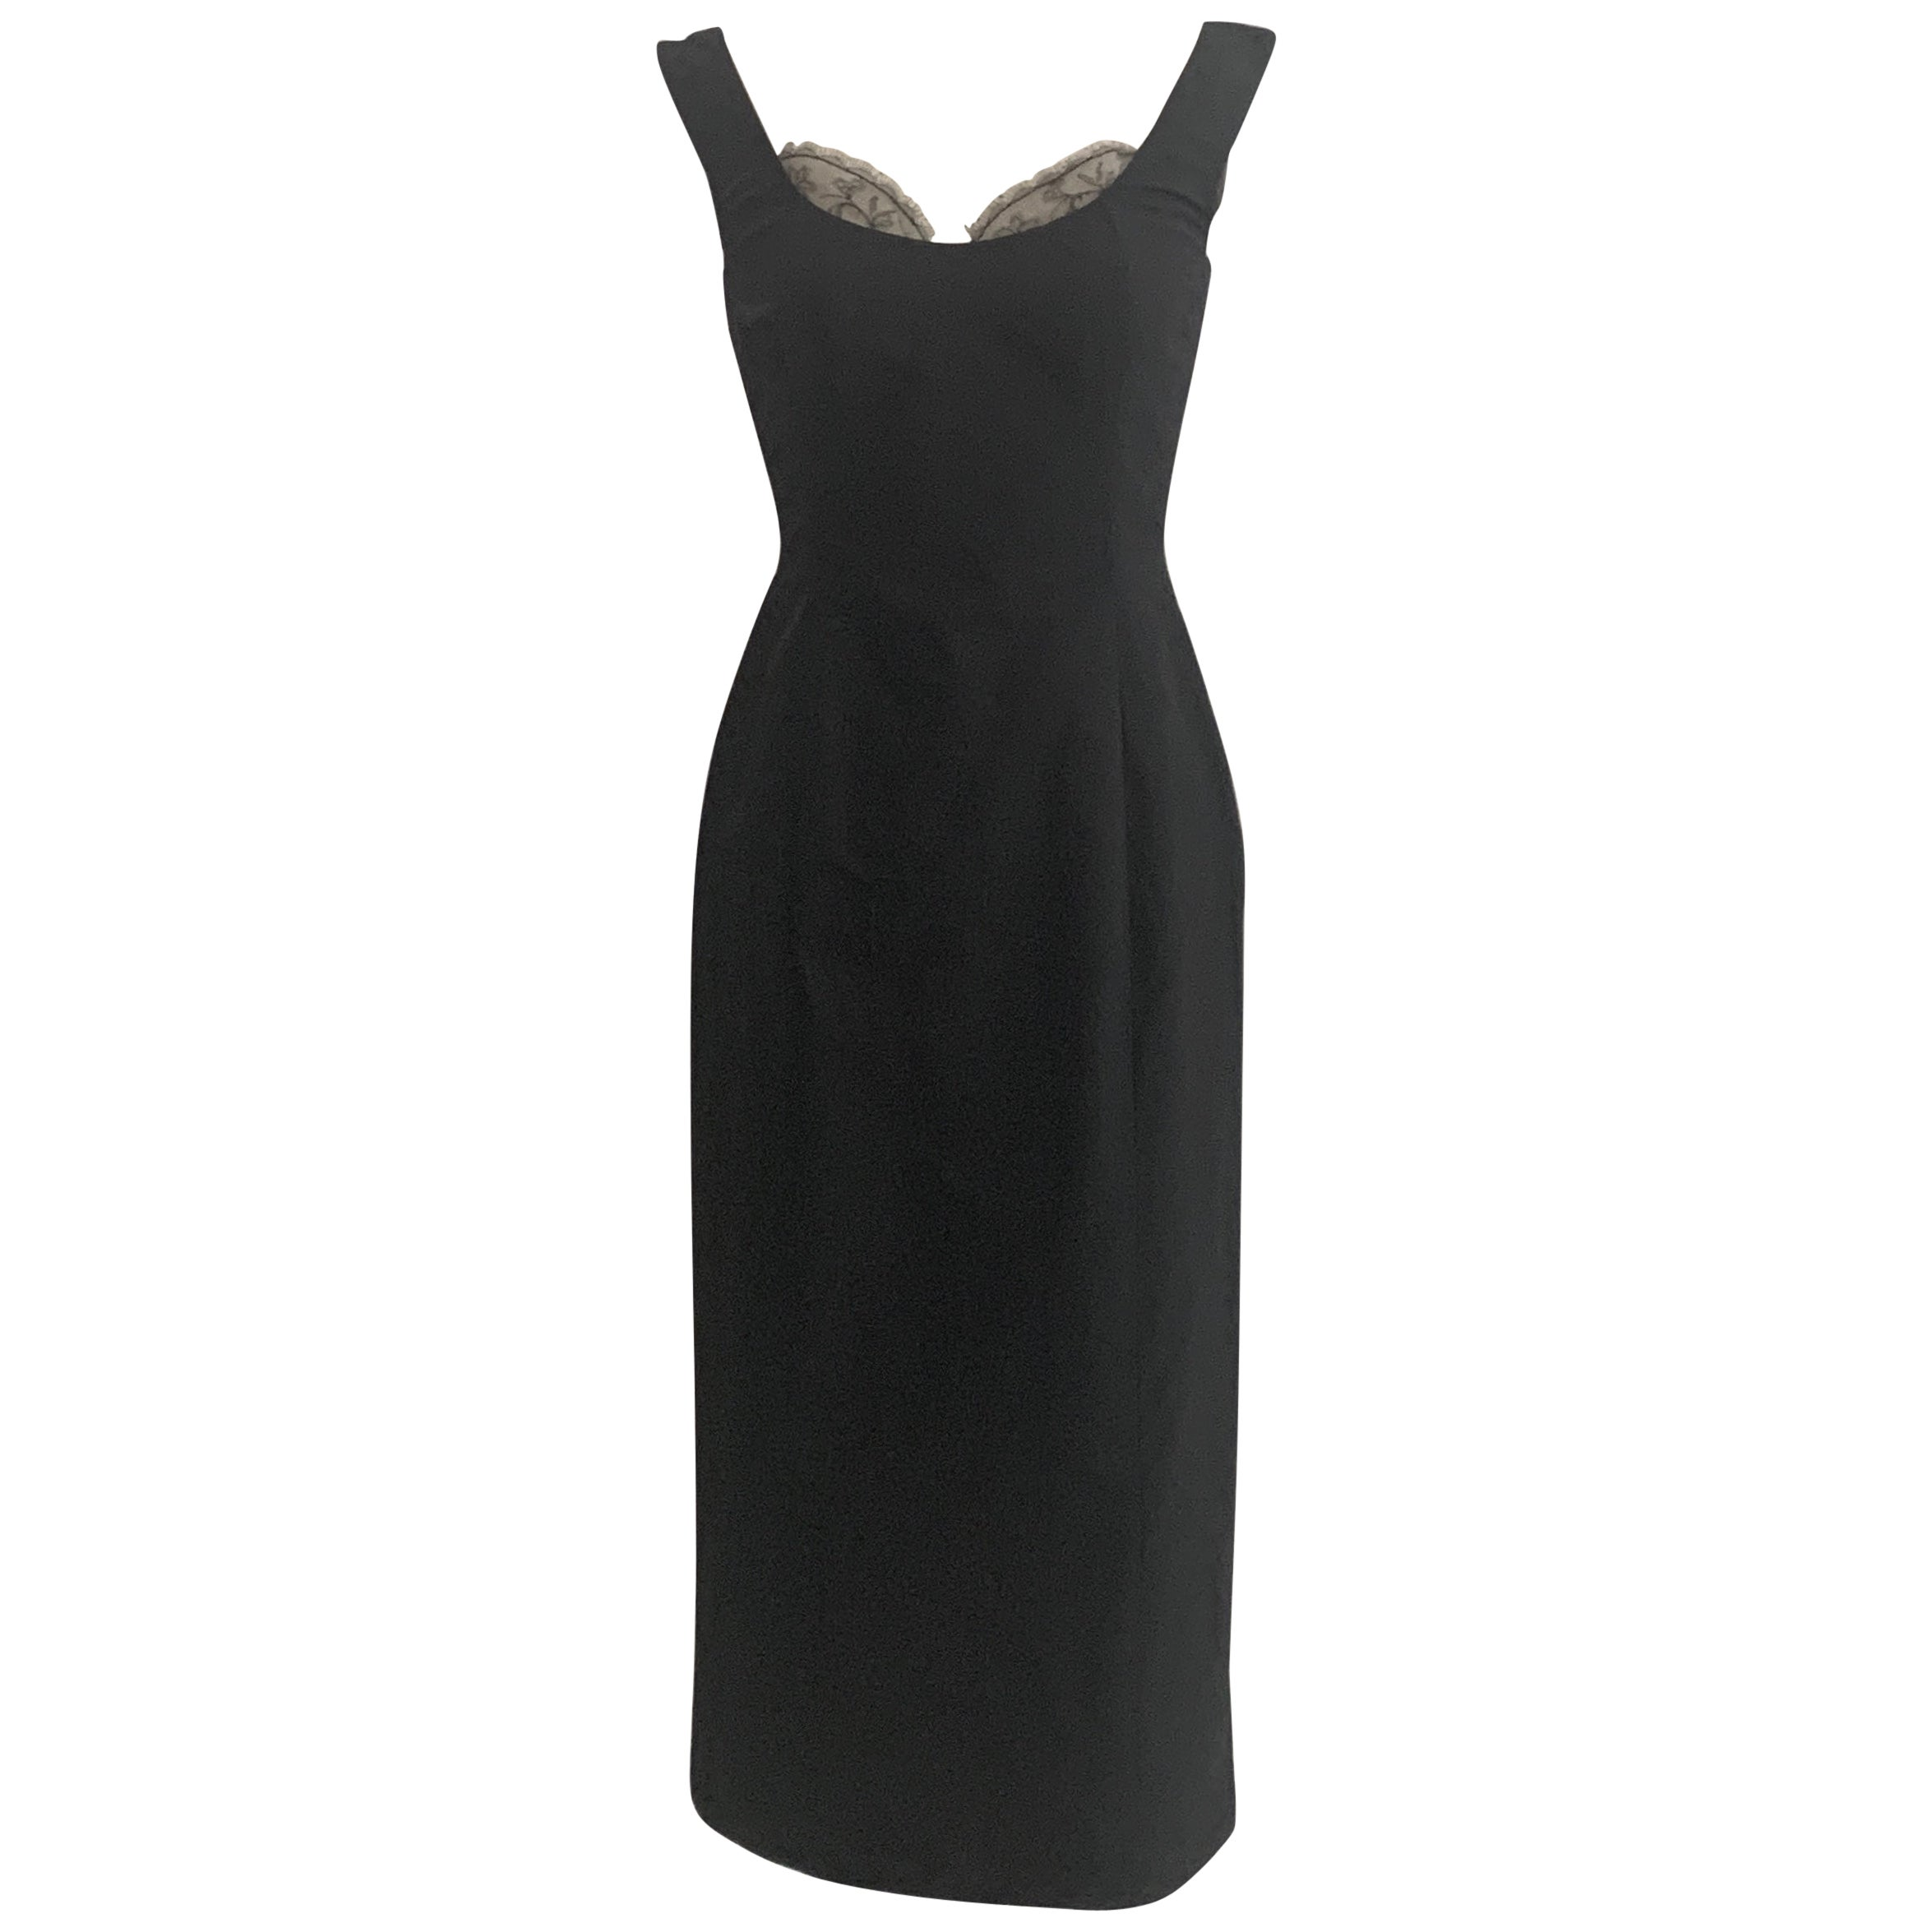 Alexander McQueen 2005 Black Silk Sleeveless Midi Wiggle Dress with Lace Trim